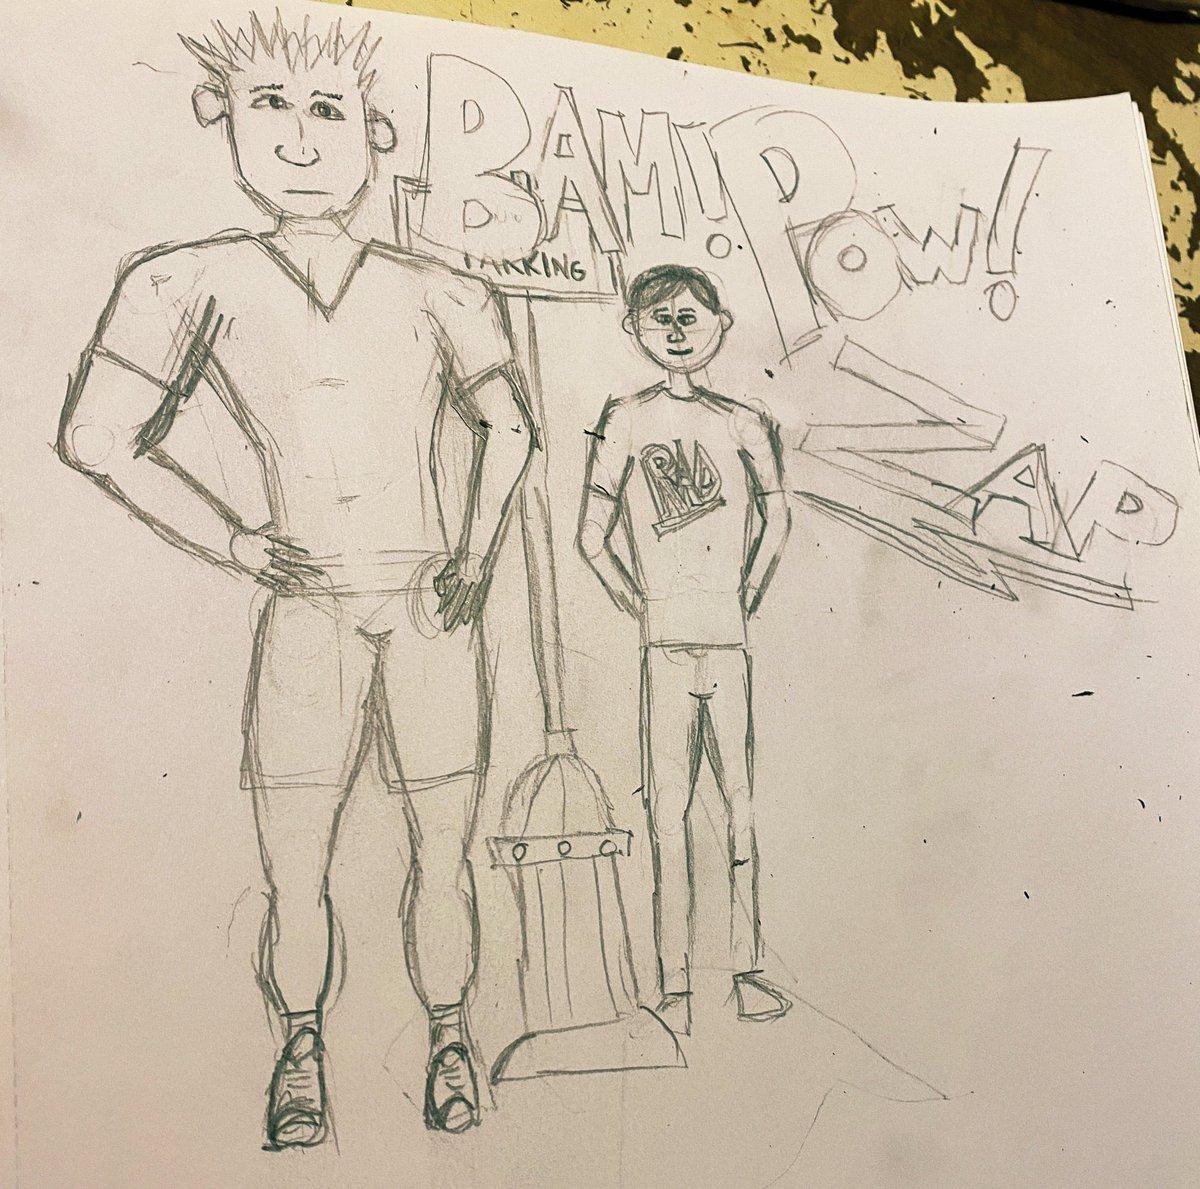 Here's a big dude and his little bro. #art #pencil #blackandwhite #bigdude #littlebro #sketching